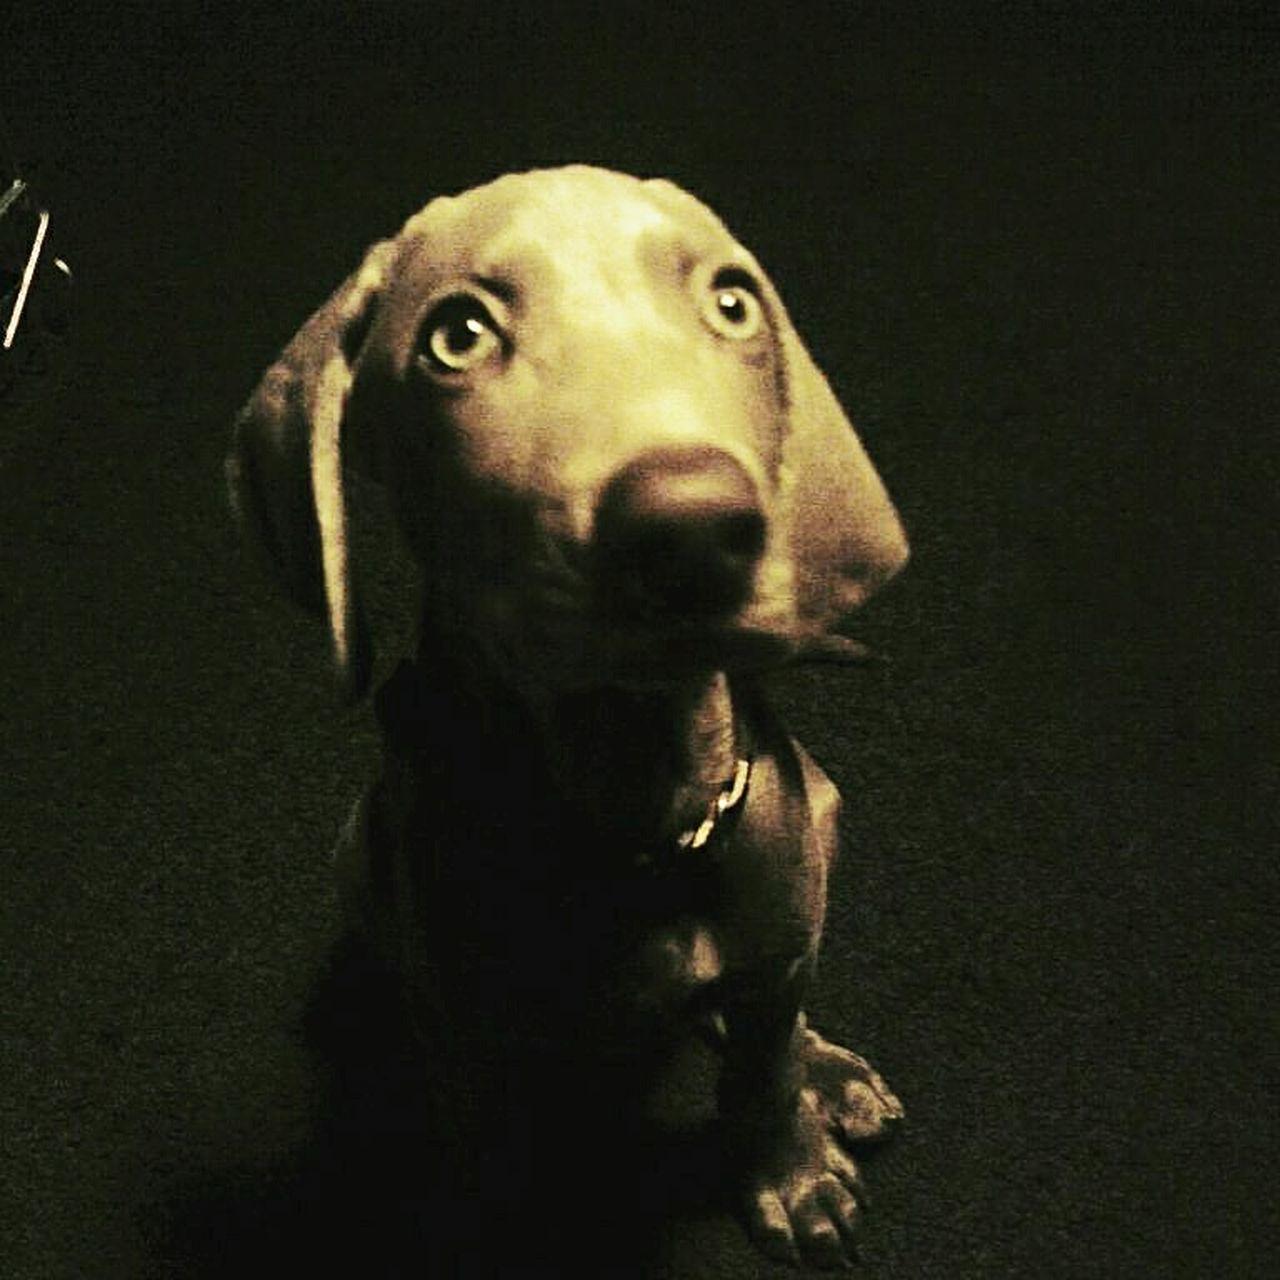 Weimaraner Puppy Looking At Camera